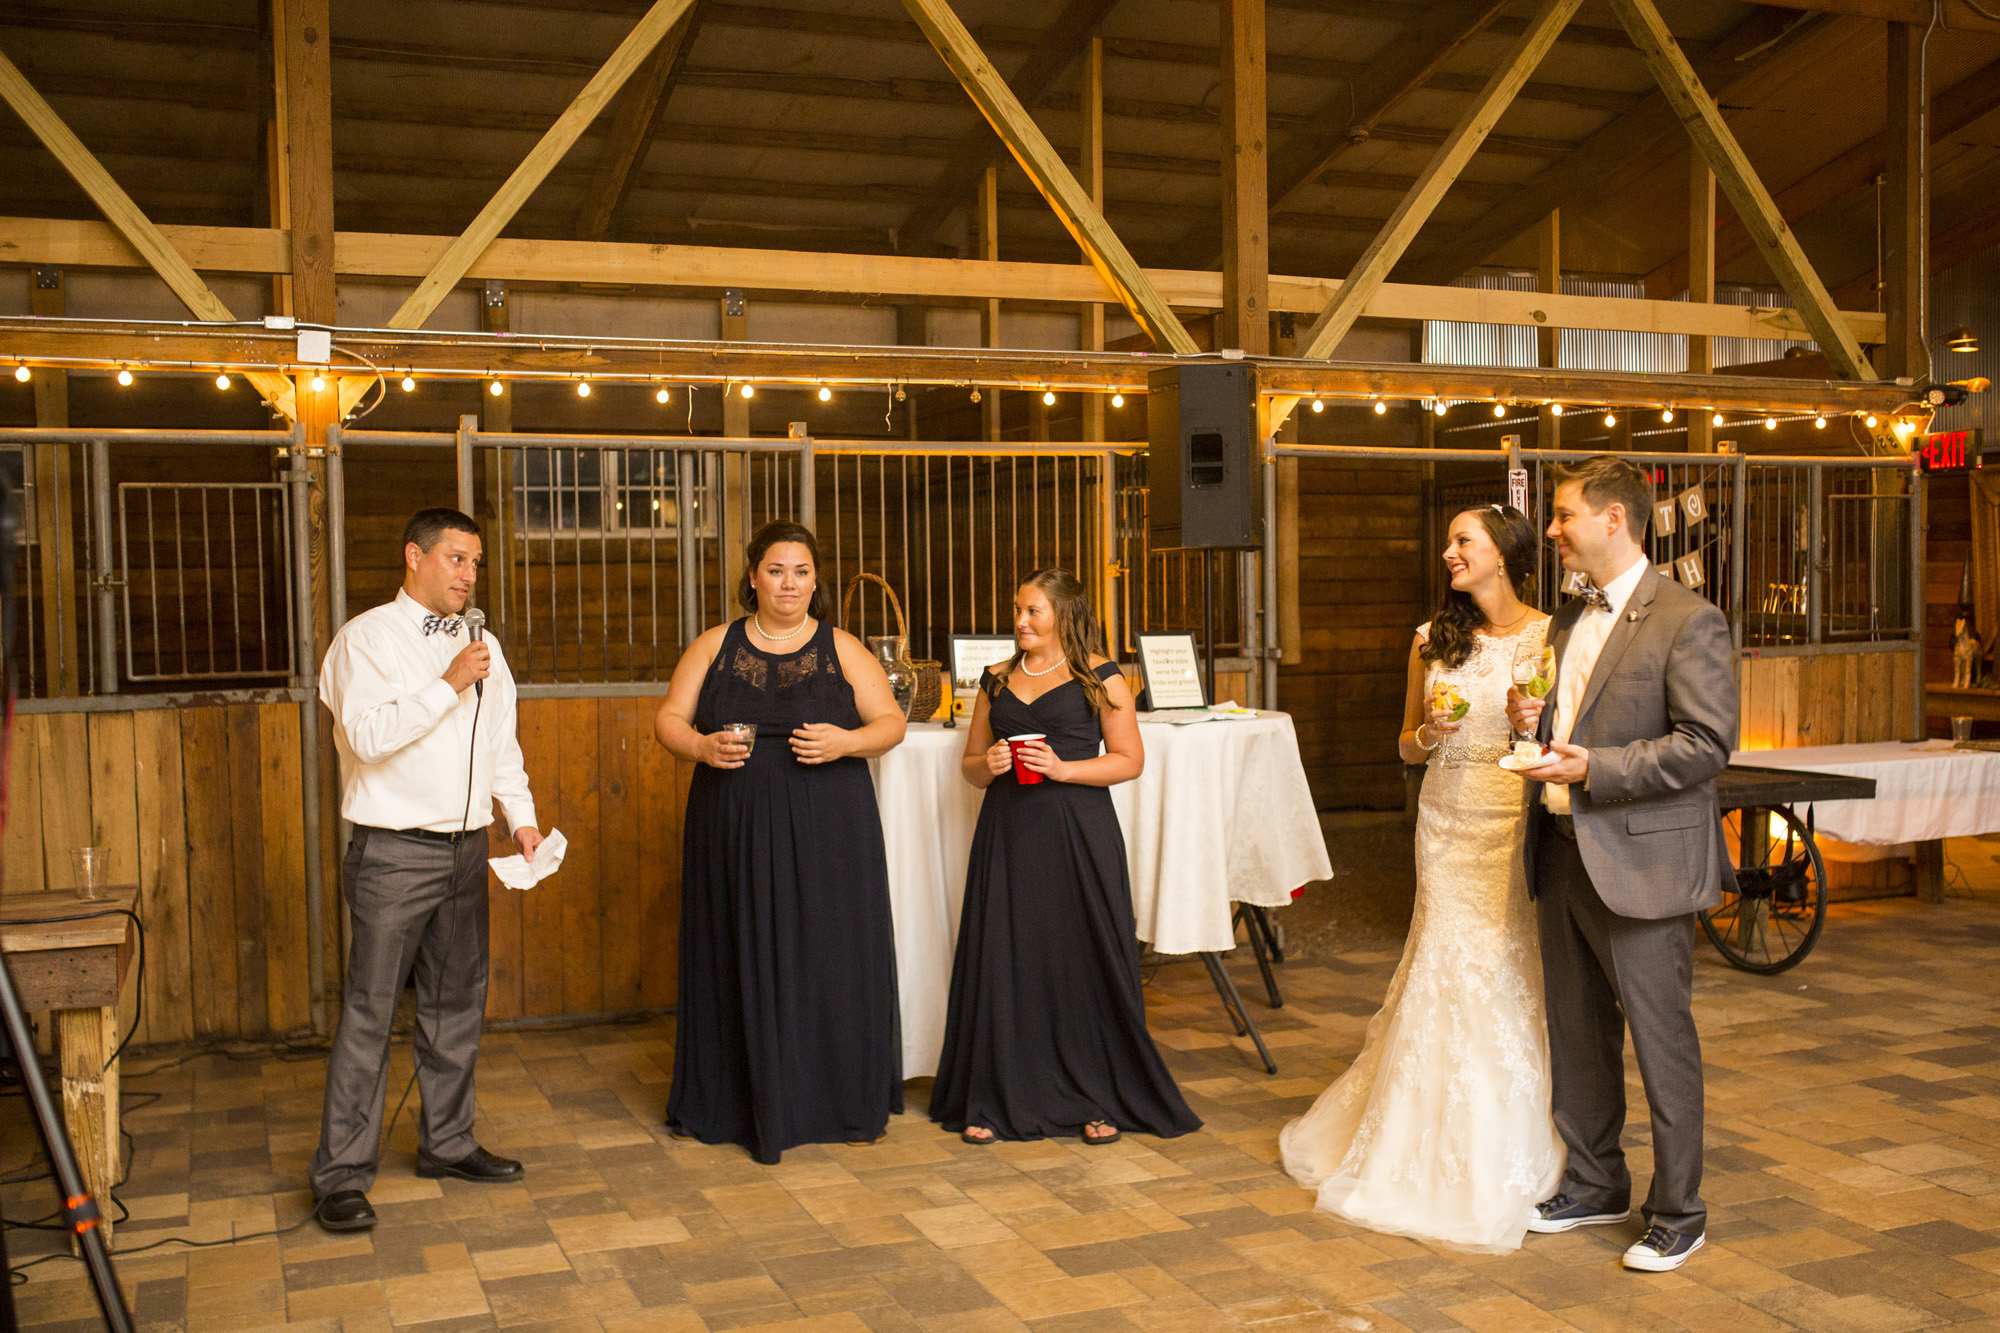 Seriously_Sabrina_Photography_Bowling_Green_Kentucky_Highland_Stables_Wedding_Wolff154.jpg